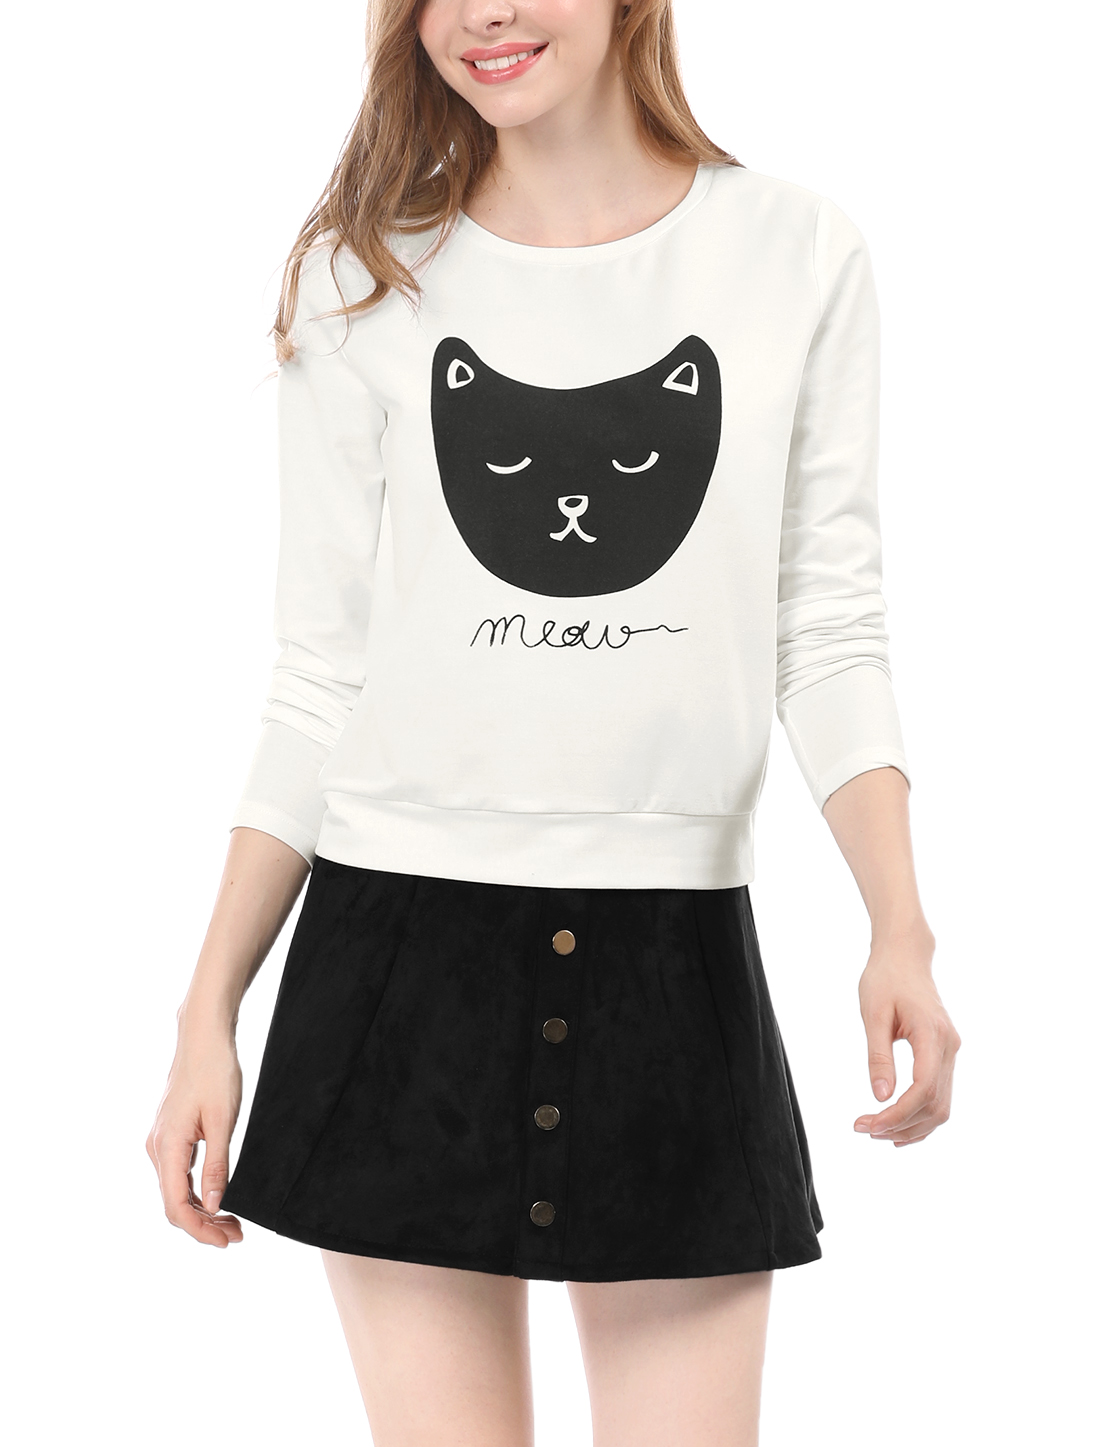 Allegra K Women Cat Prints Round Neck Long Sleeves Top Shirt White L